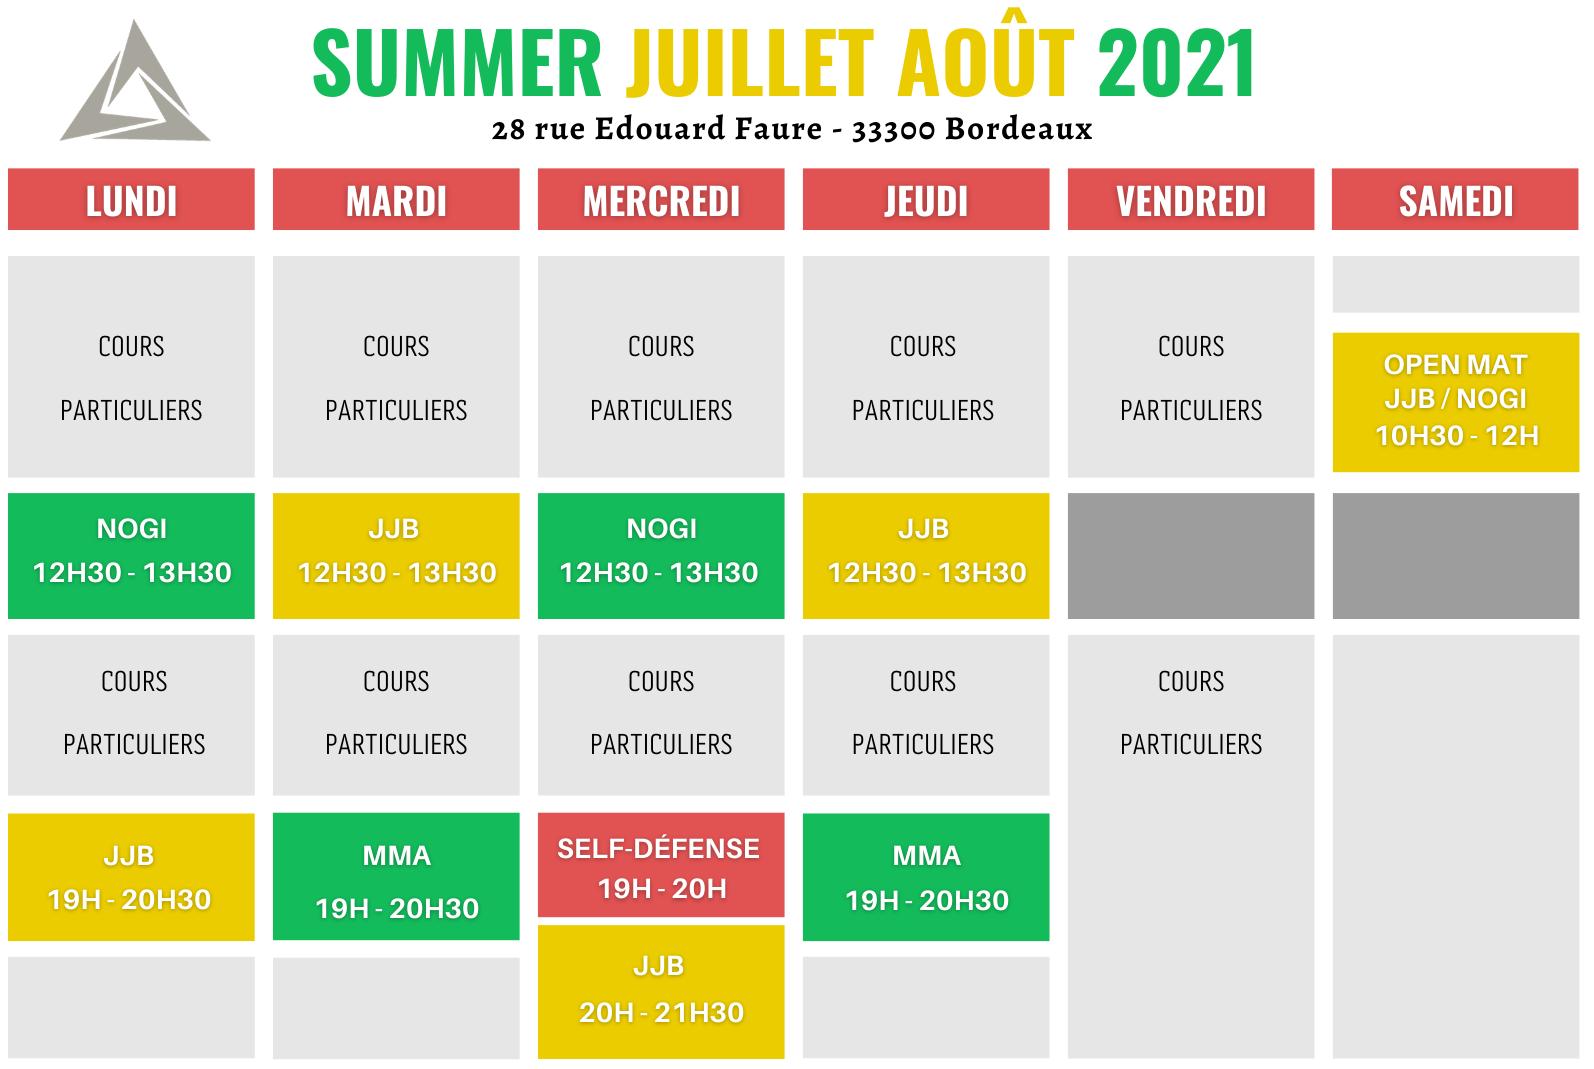 horaires mma jjb bordeaux 2021